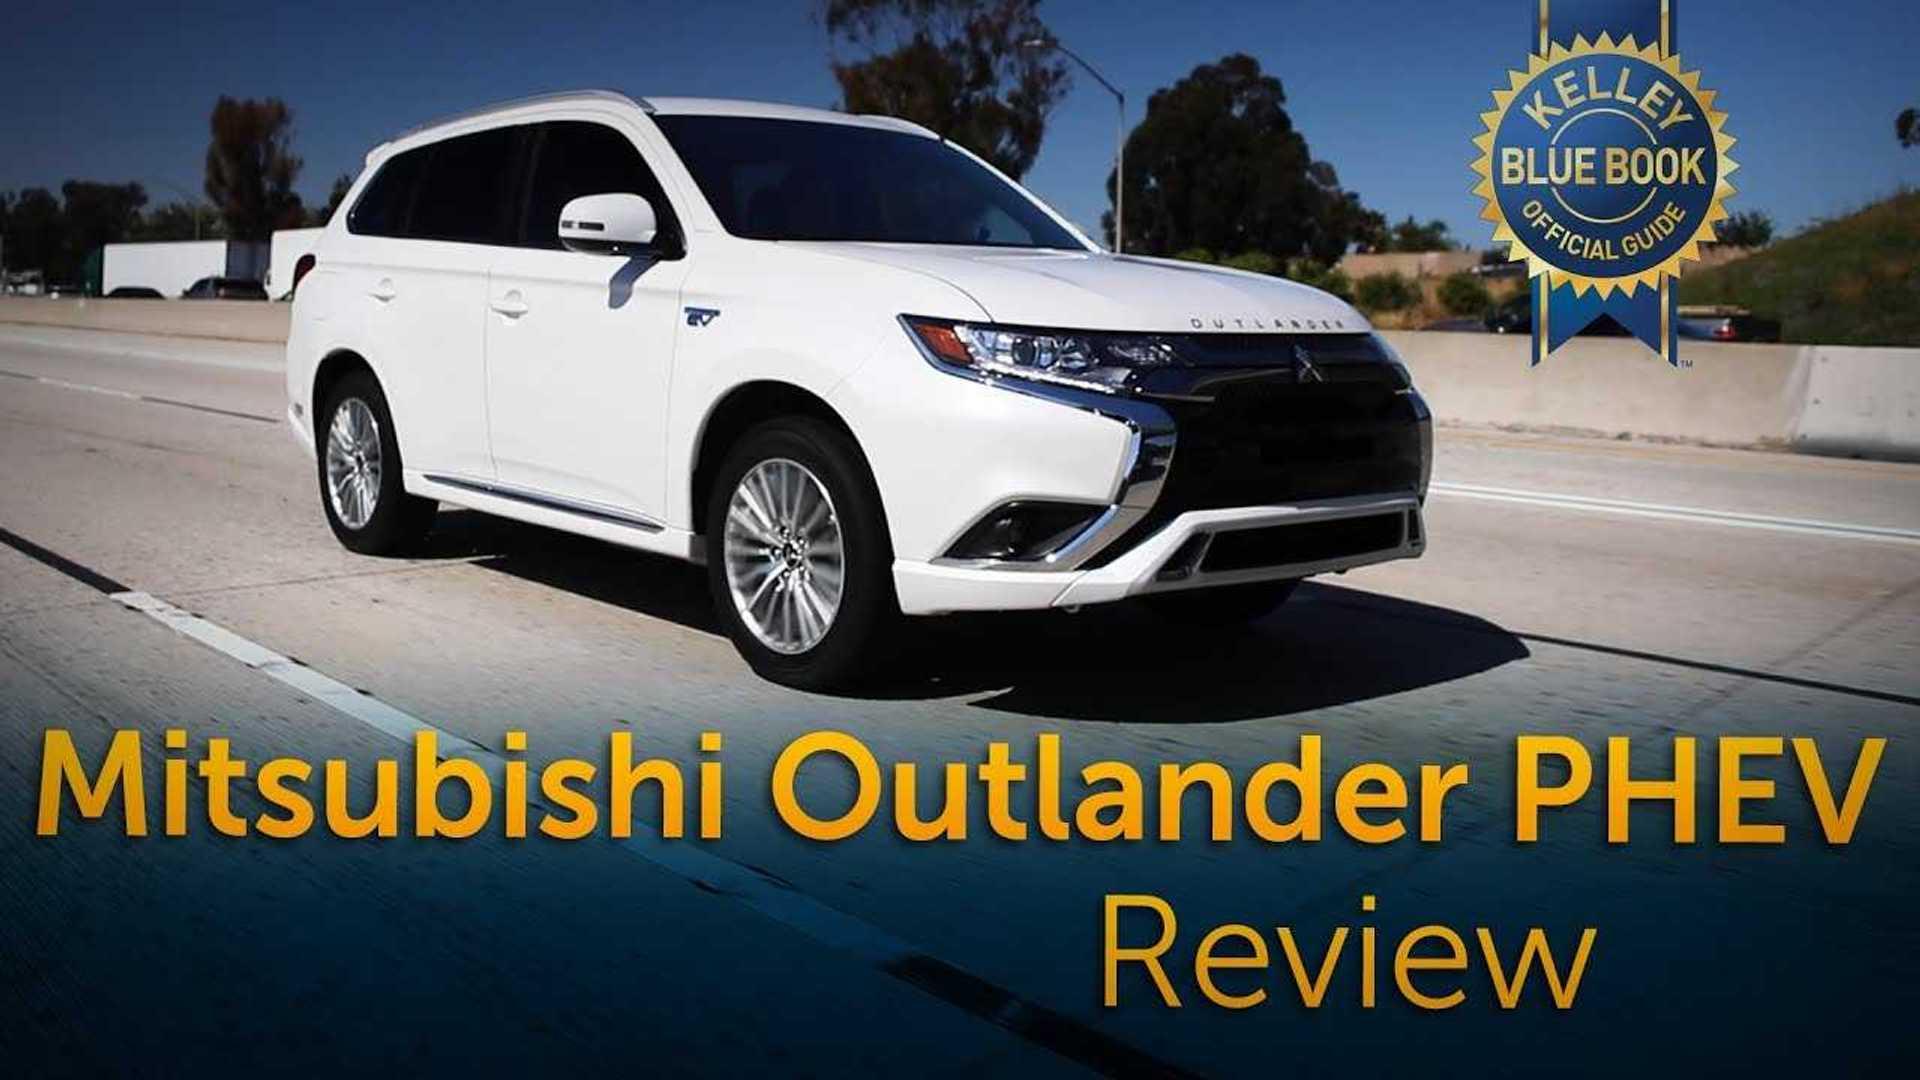 Kelley Blue Book Checks Out 2019 Mitsubishi Outlander PHEV: Video